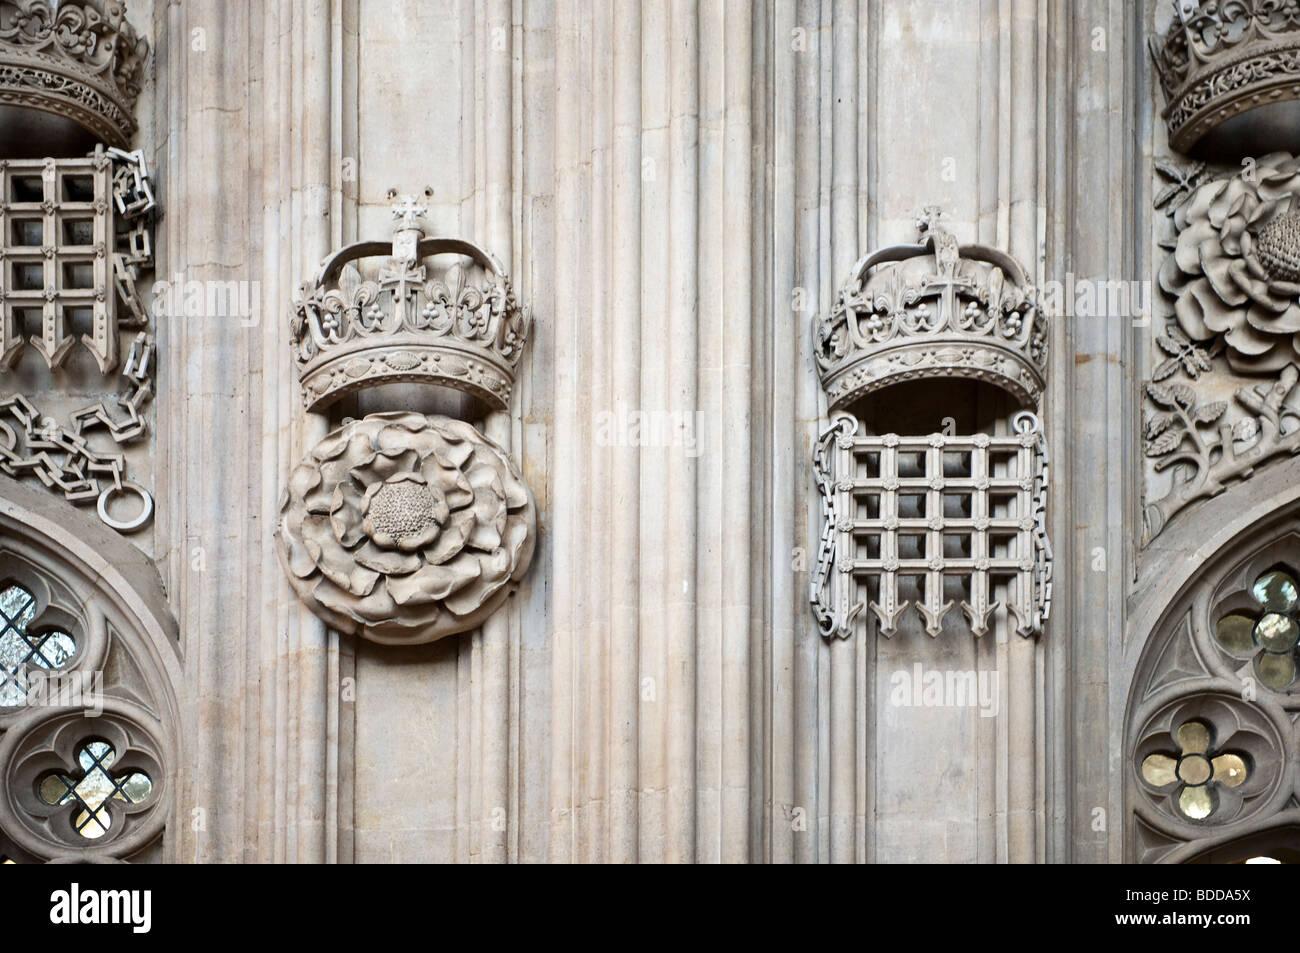 Detail Images of Trinity College Chapel, Cambridge, UK - Stock Image